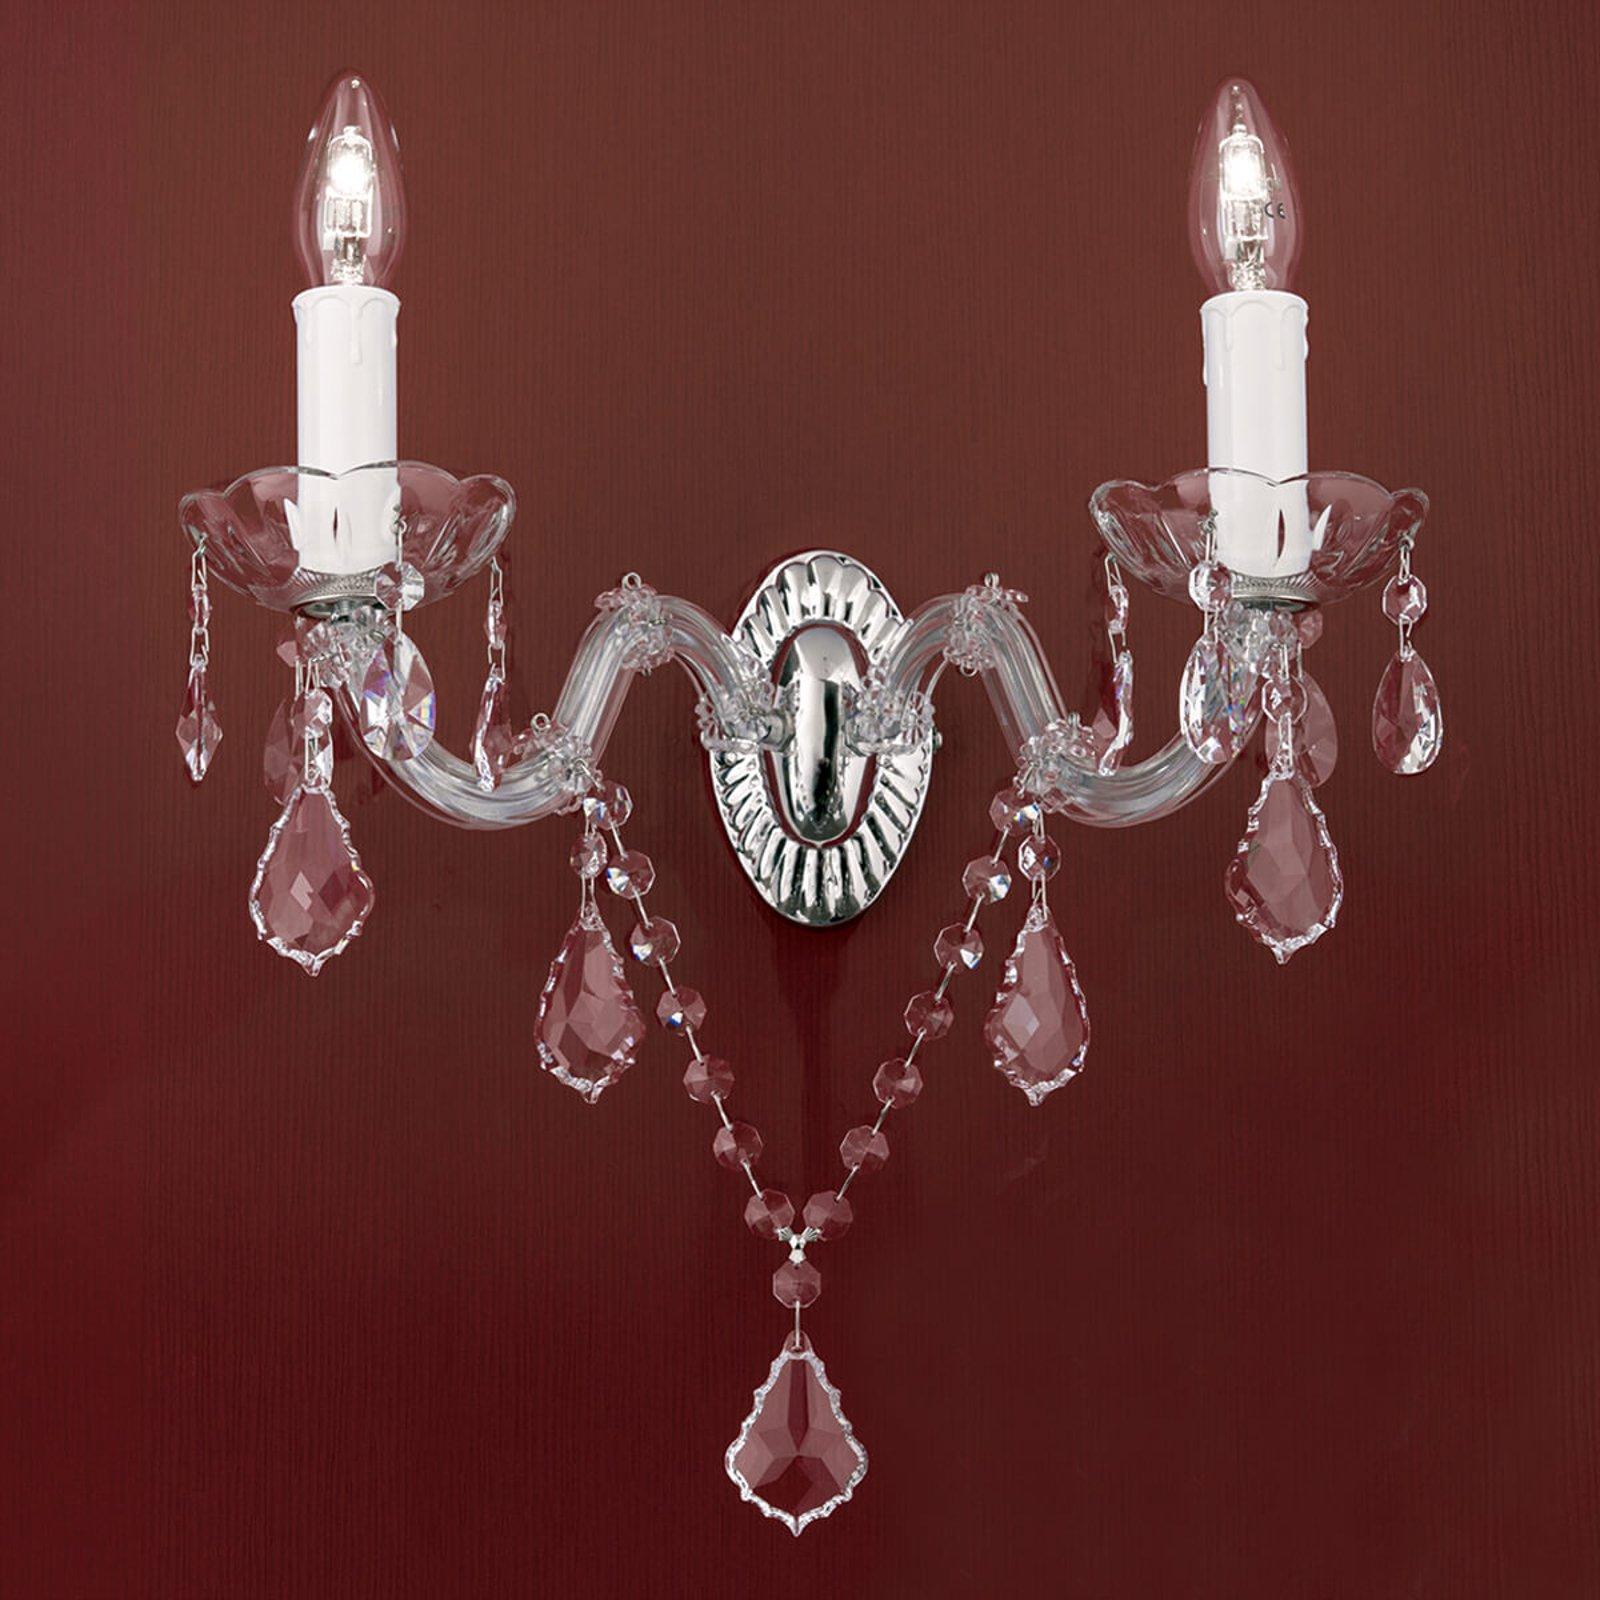 Vegglampe i krystall Maria Theresia